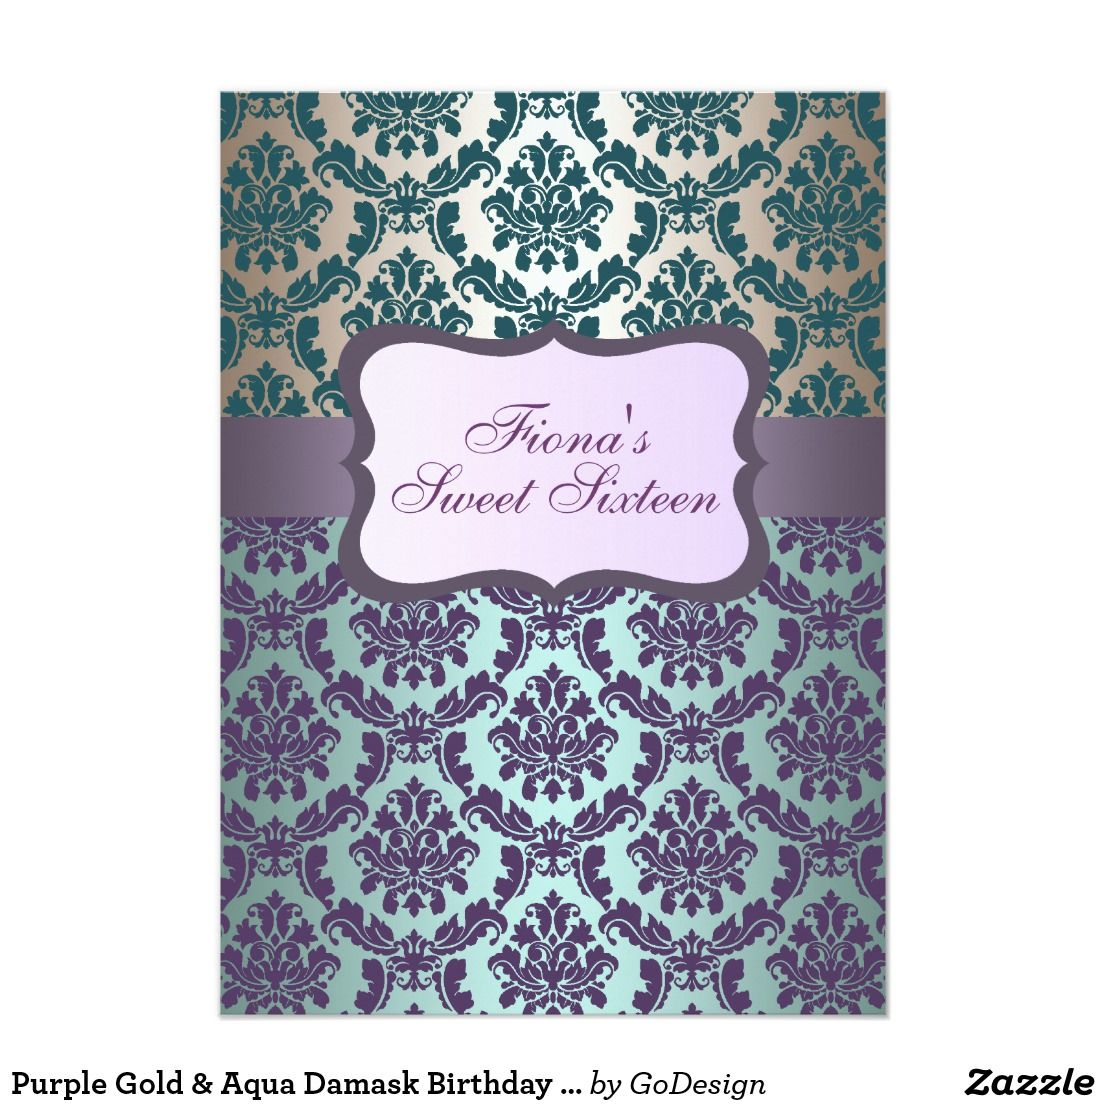 Purple Gold & Aqua Damask Birthday Invite This Elegant Sweet Sixteen ...